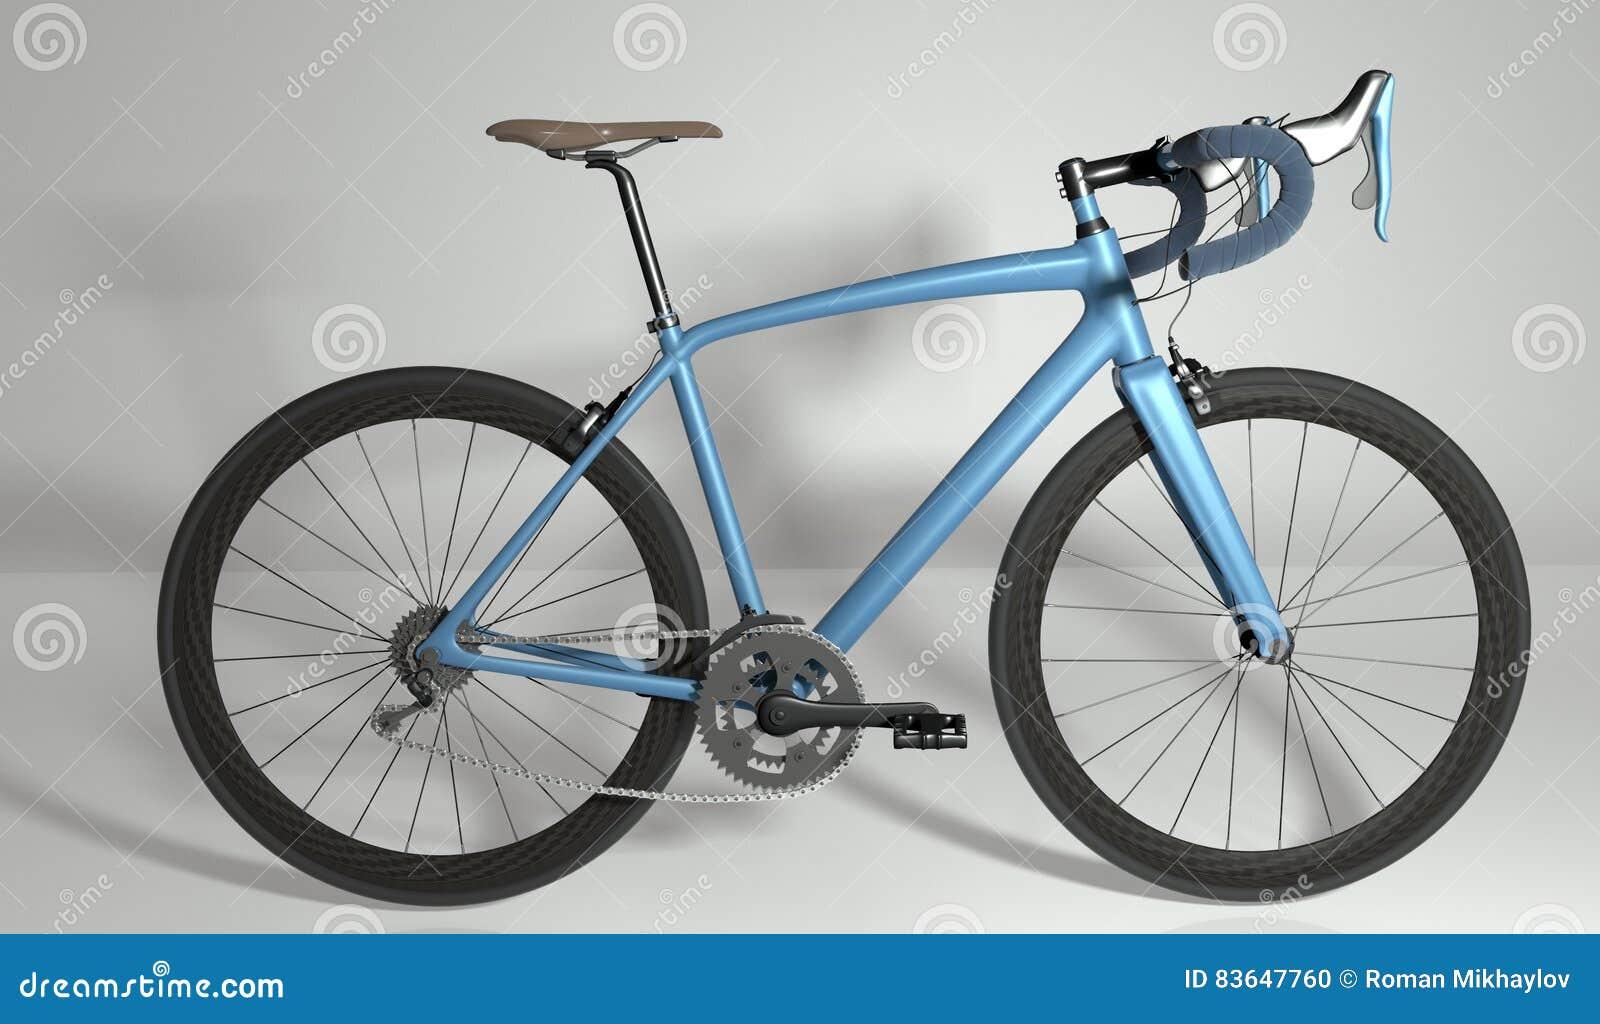 Road Bike Side View  3D Illustration Stock Illustration